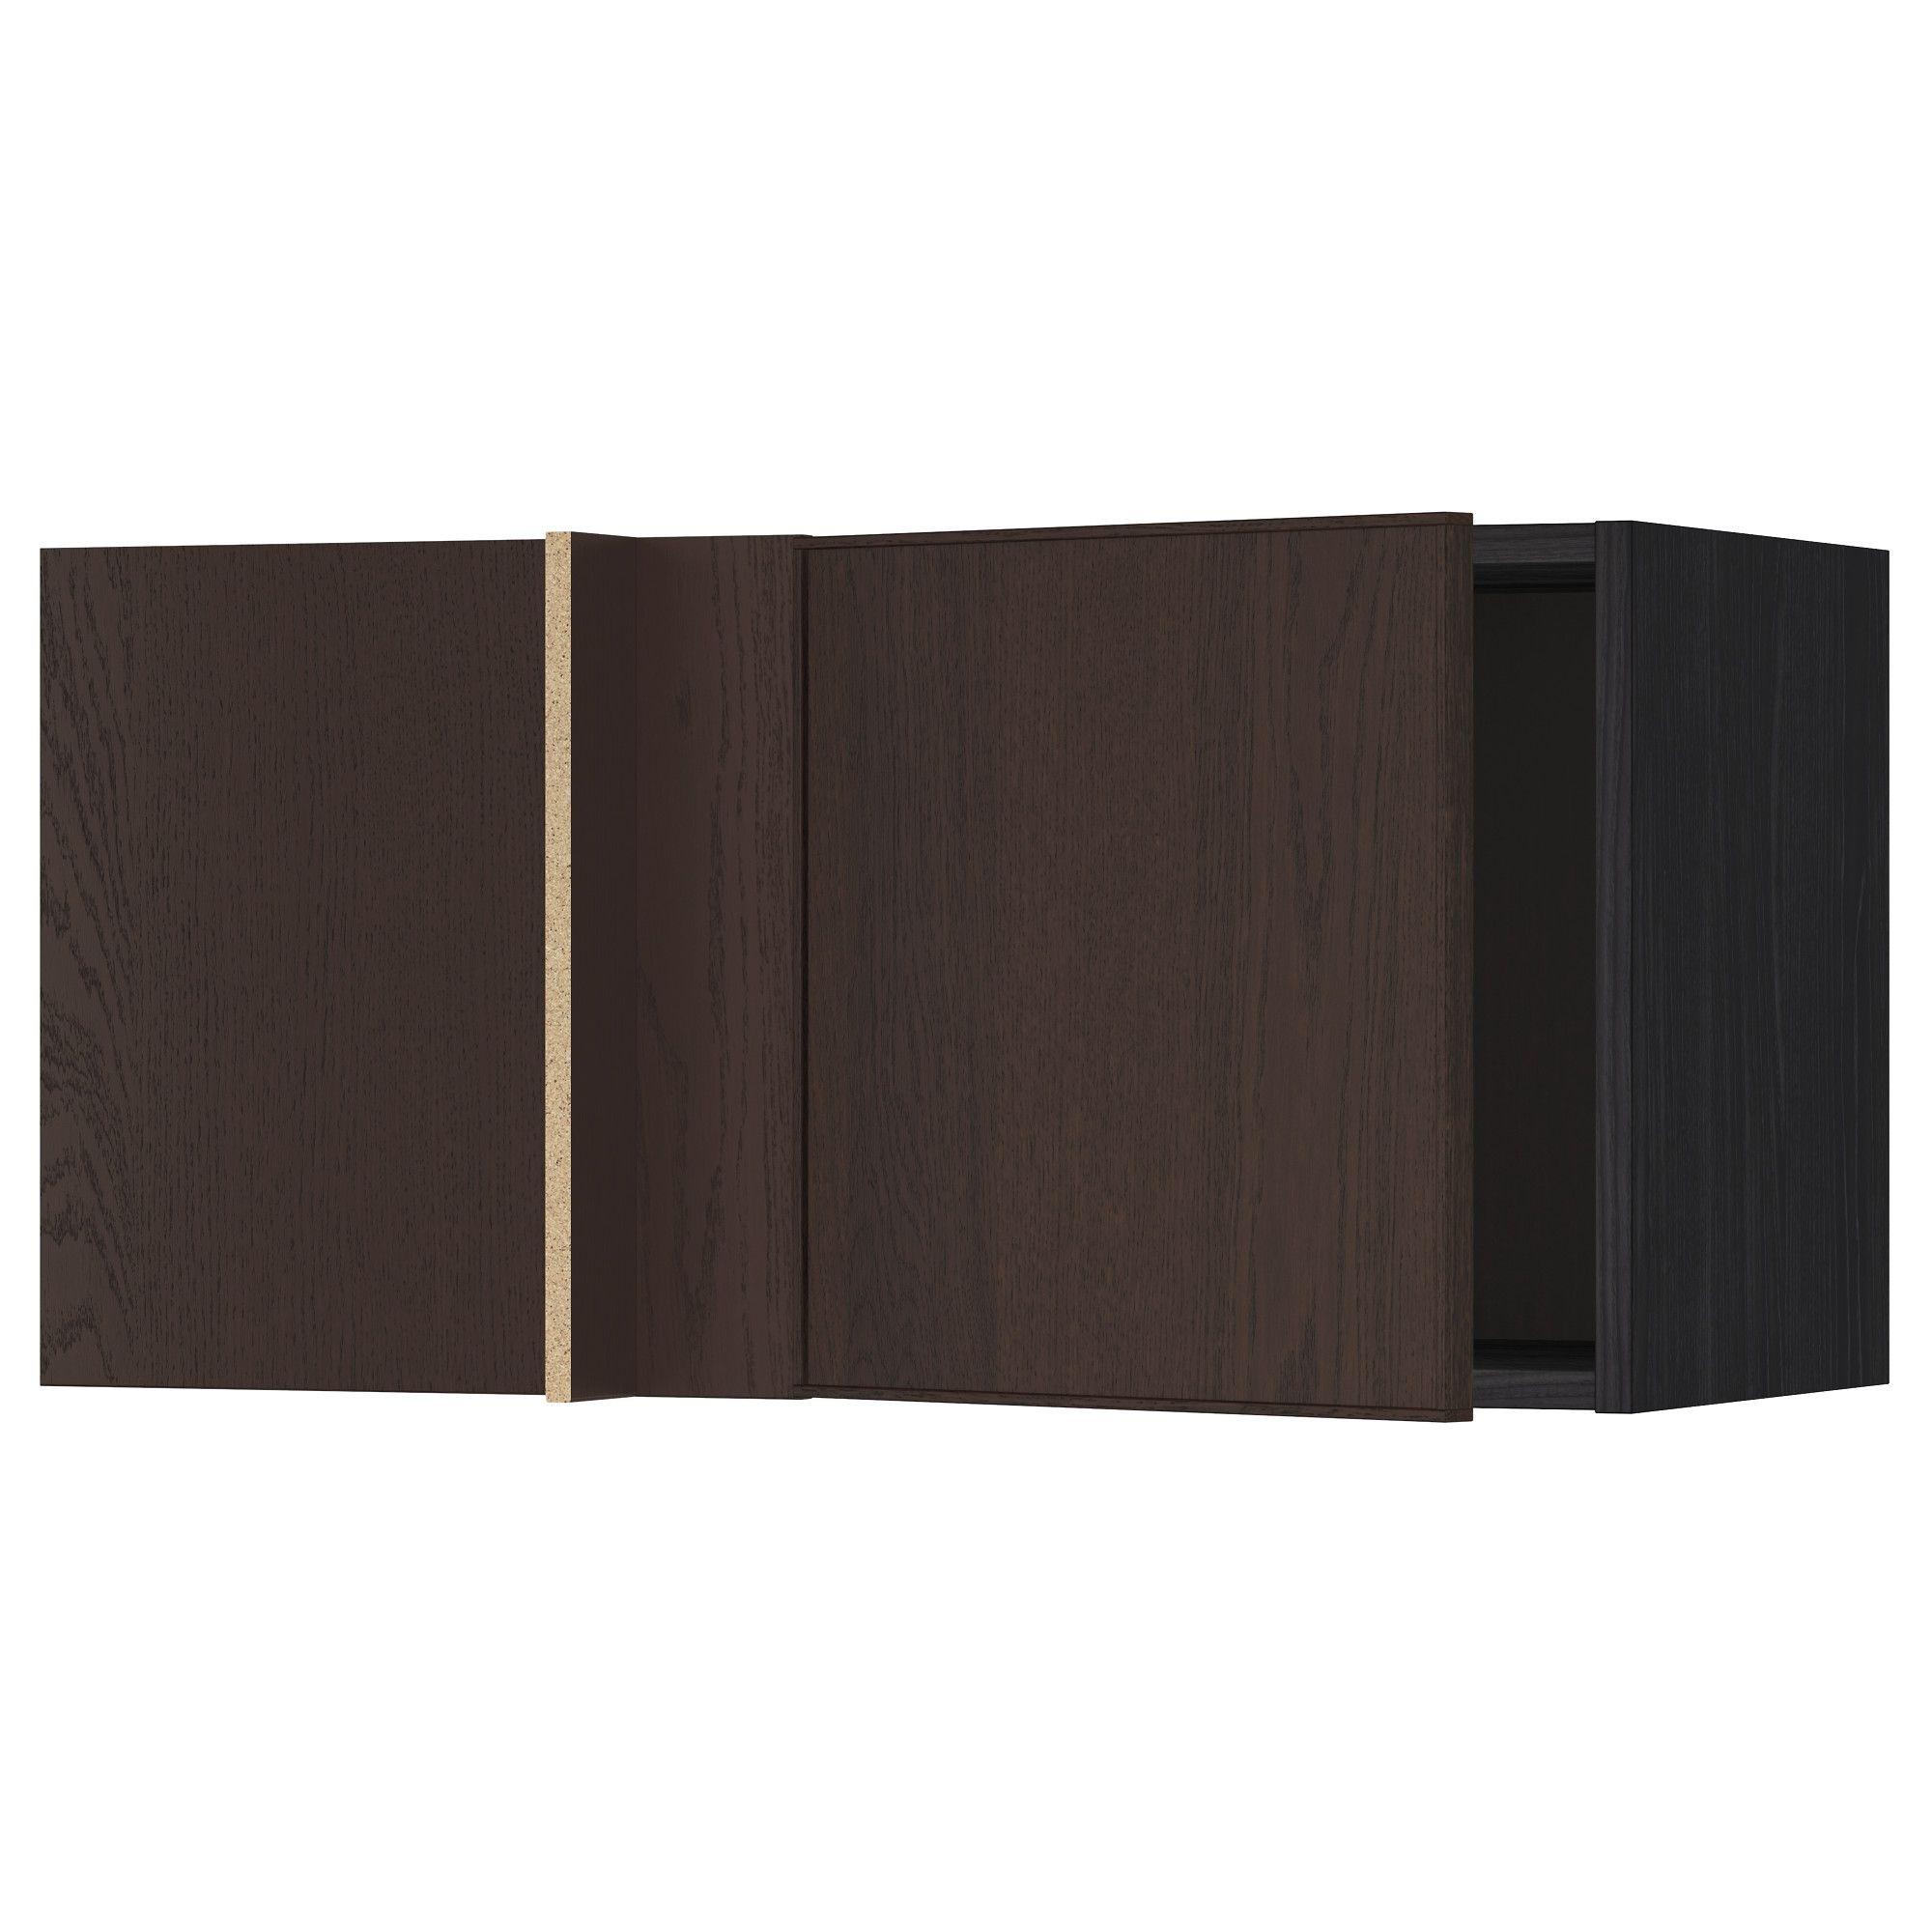 Metod Ikea Modular Kitchens Komnit Furniture Wall Cabinet Kitchen Wall Cabinets Ikea